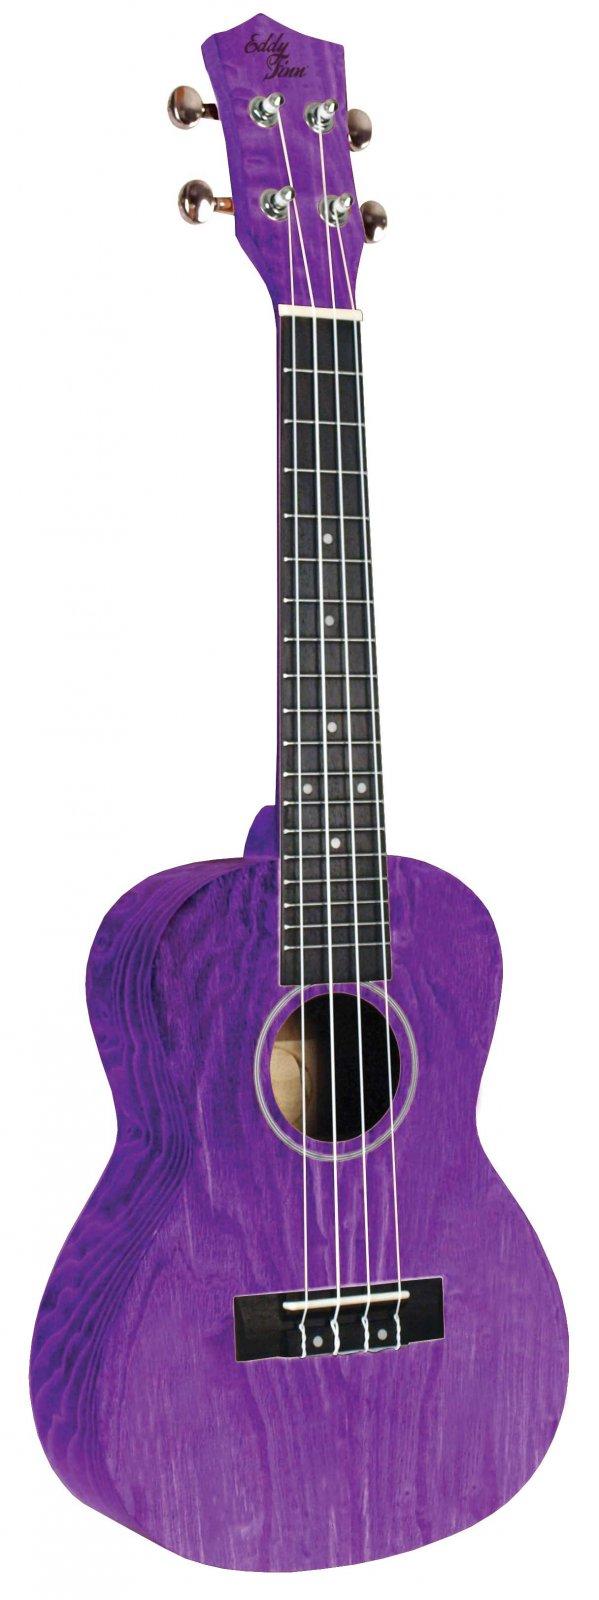 Eddy Finn EF-ASH-PR Concert Ash Purple